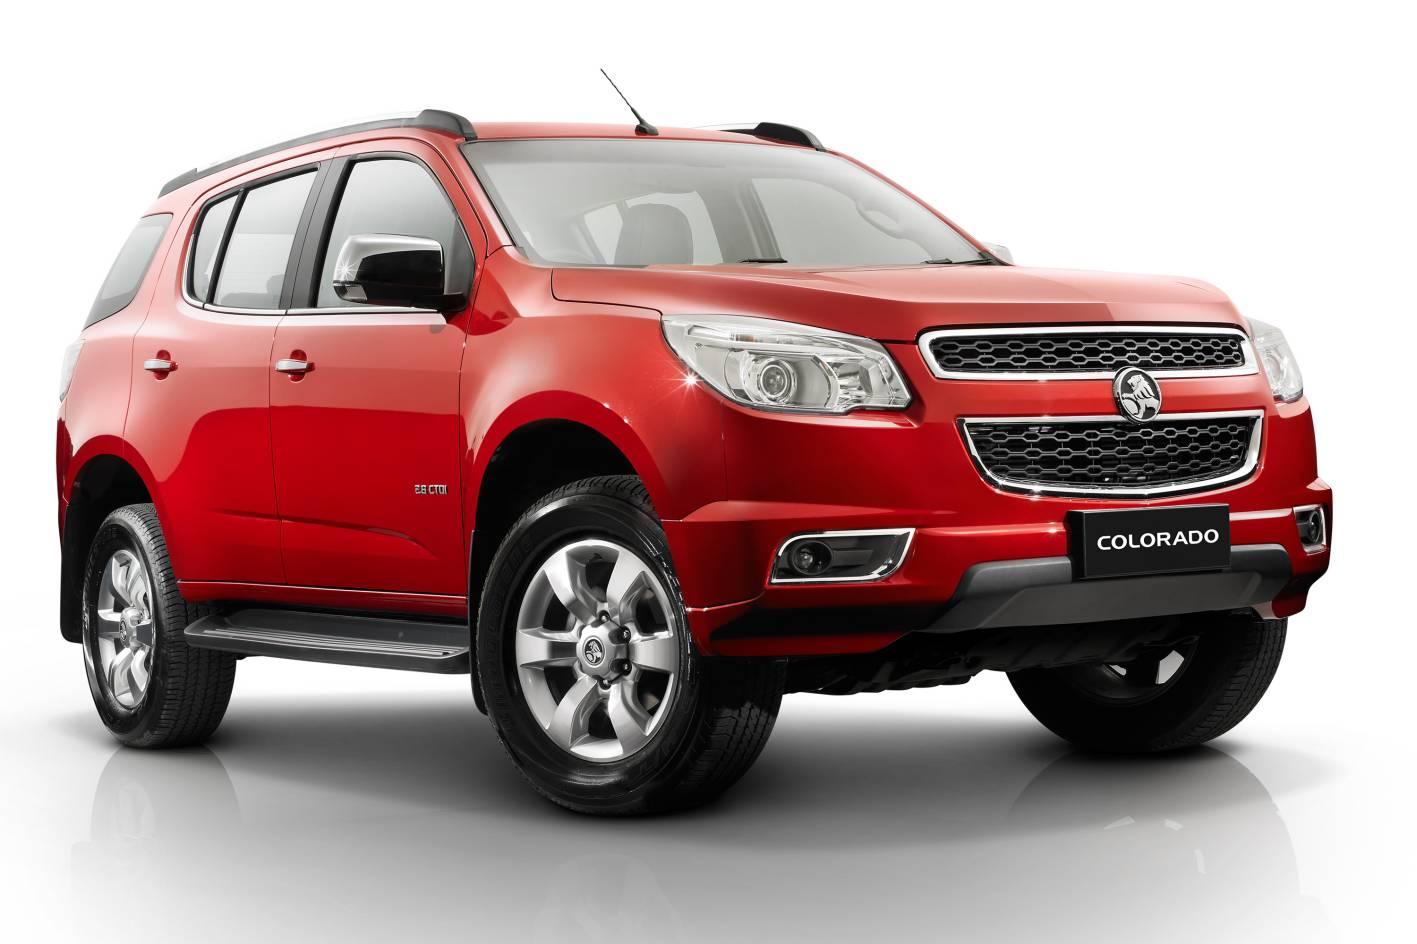 Mahindra And Mahindra Cars Wallpapers News Holden Launches Colorado 7 Suv